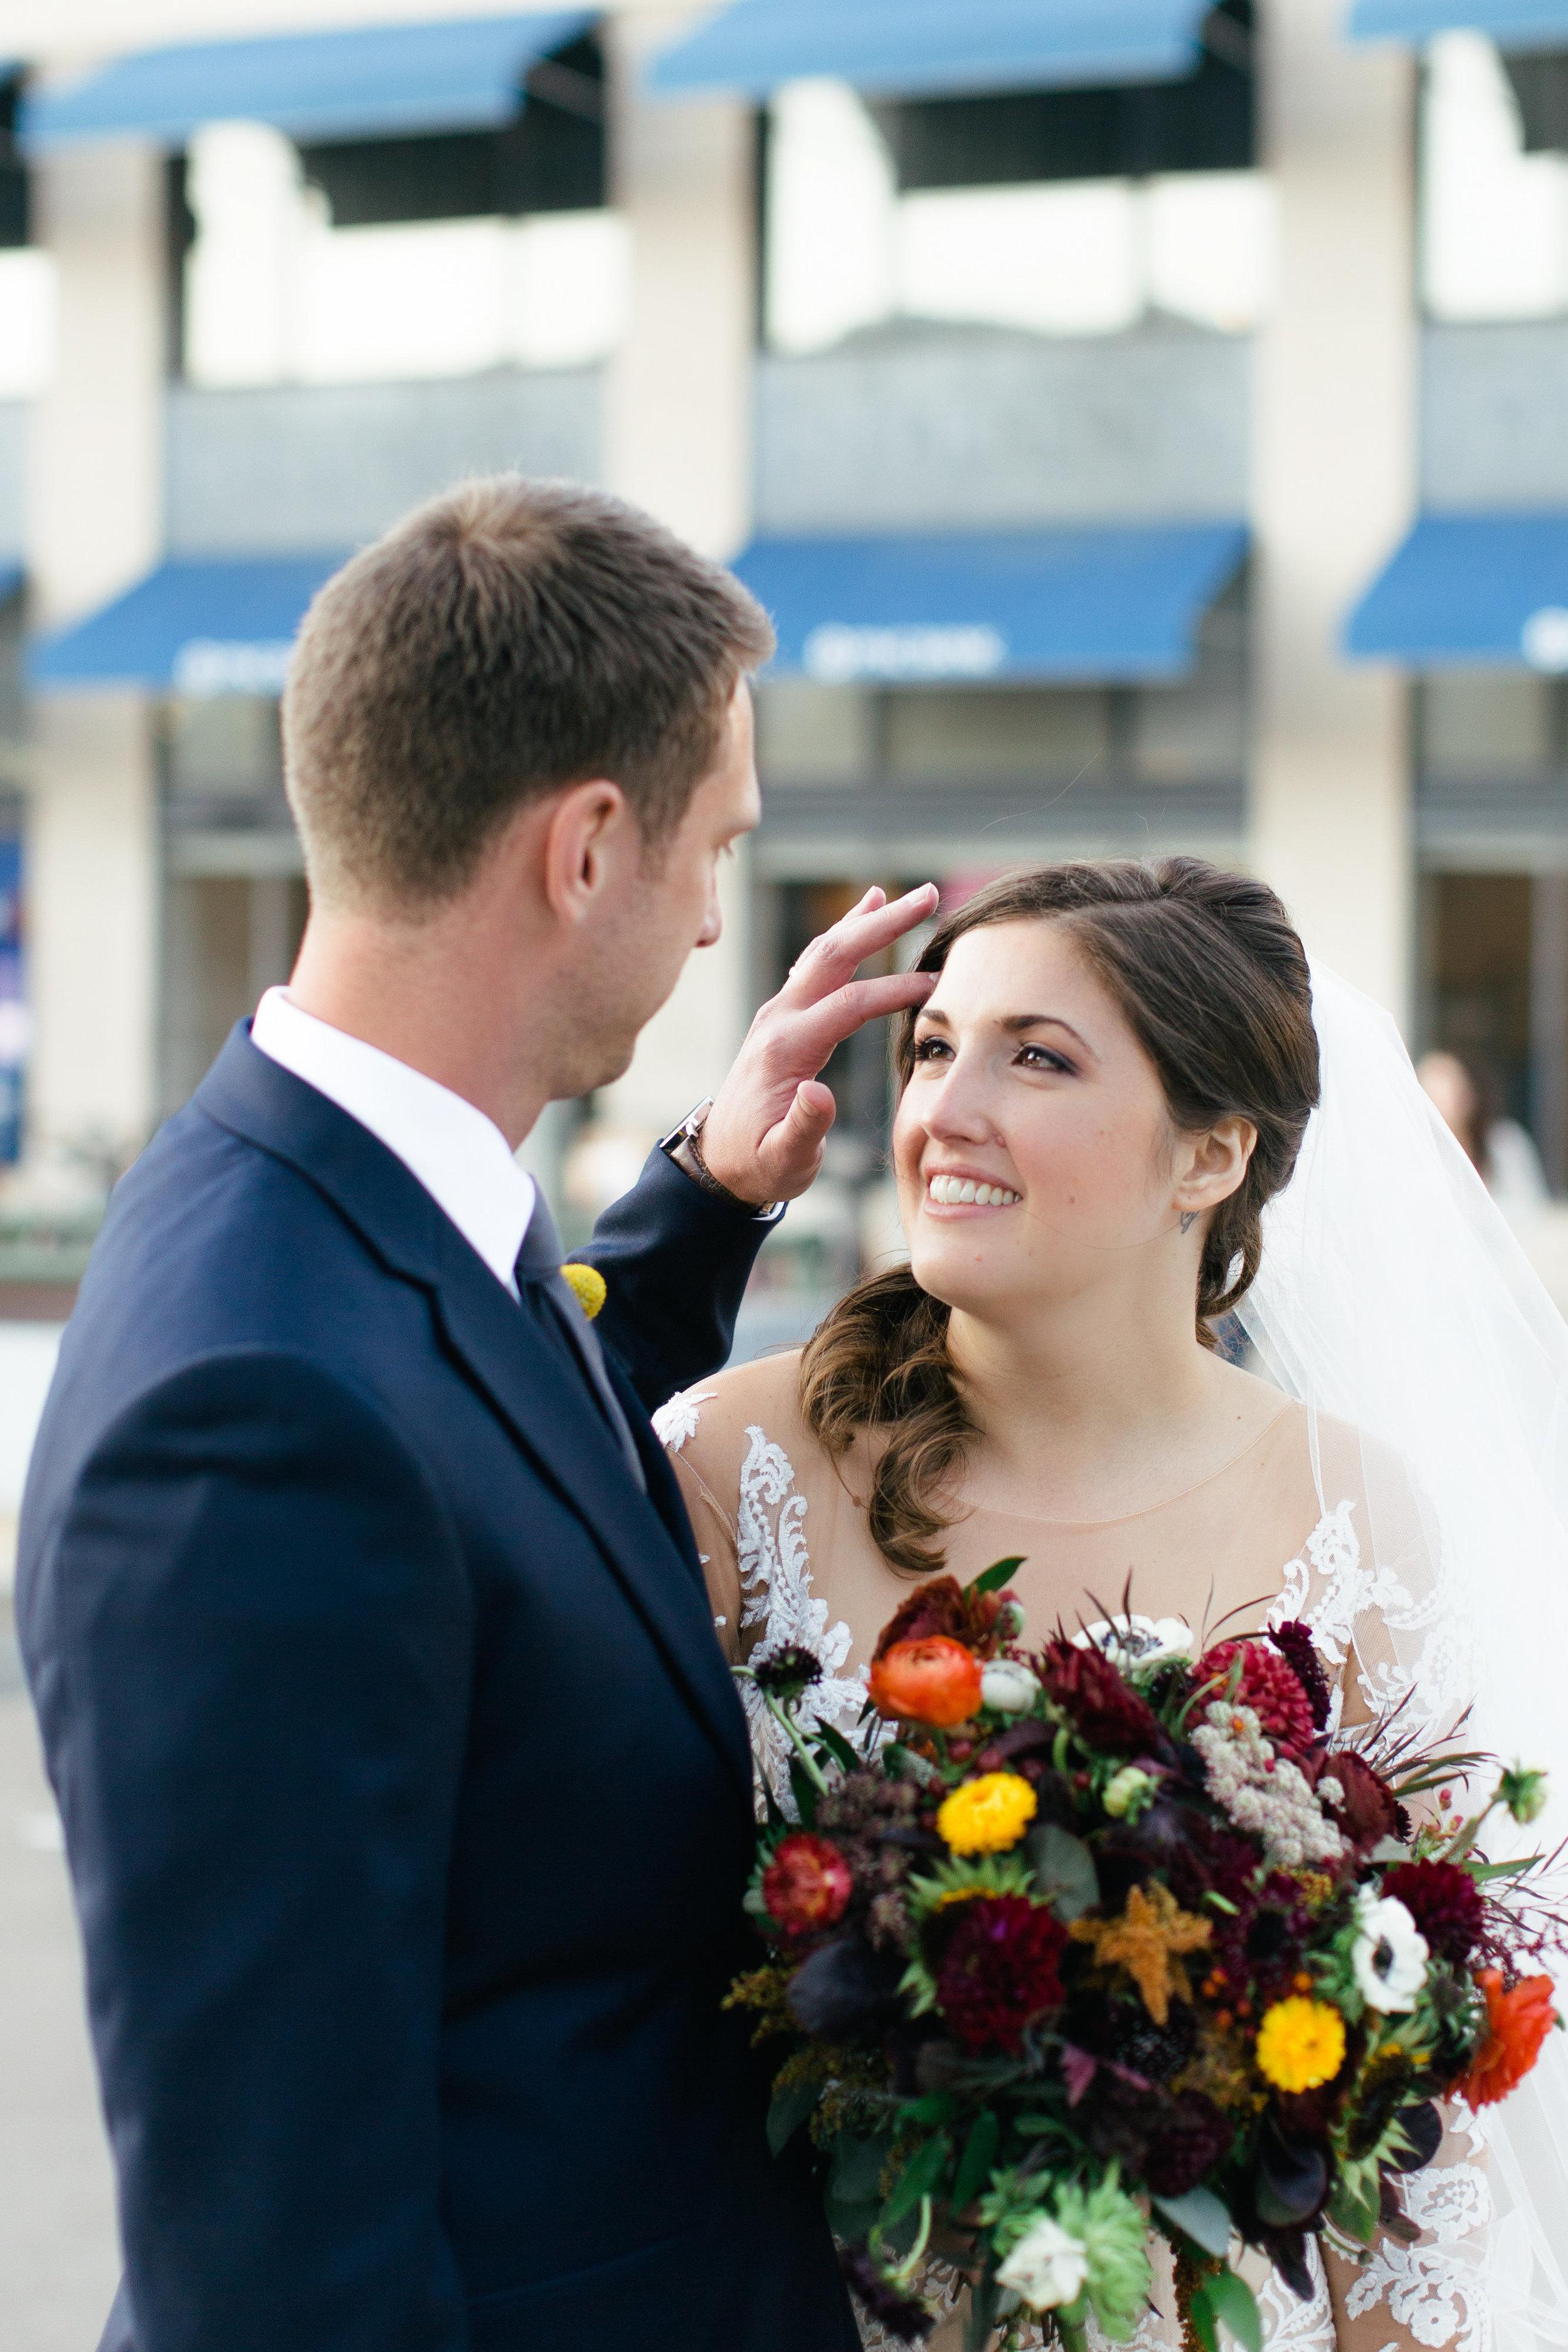 Dupon Circle Wedding | Washington DC Wedding Photography | Rebecca Wilcher Photography -18.jpg